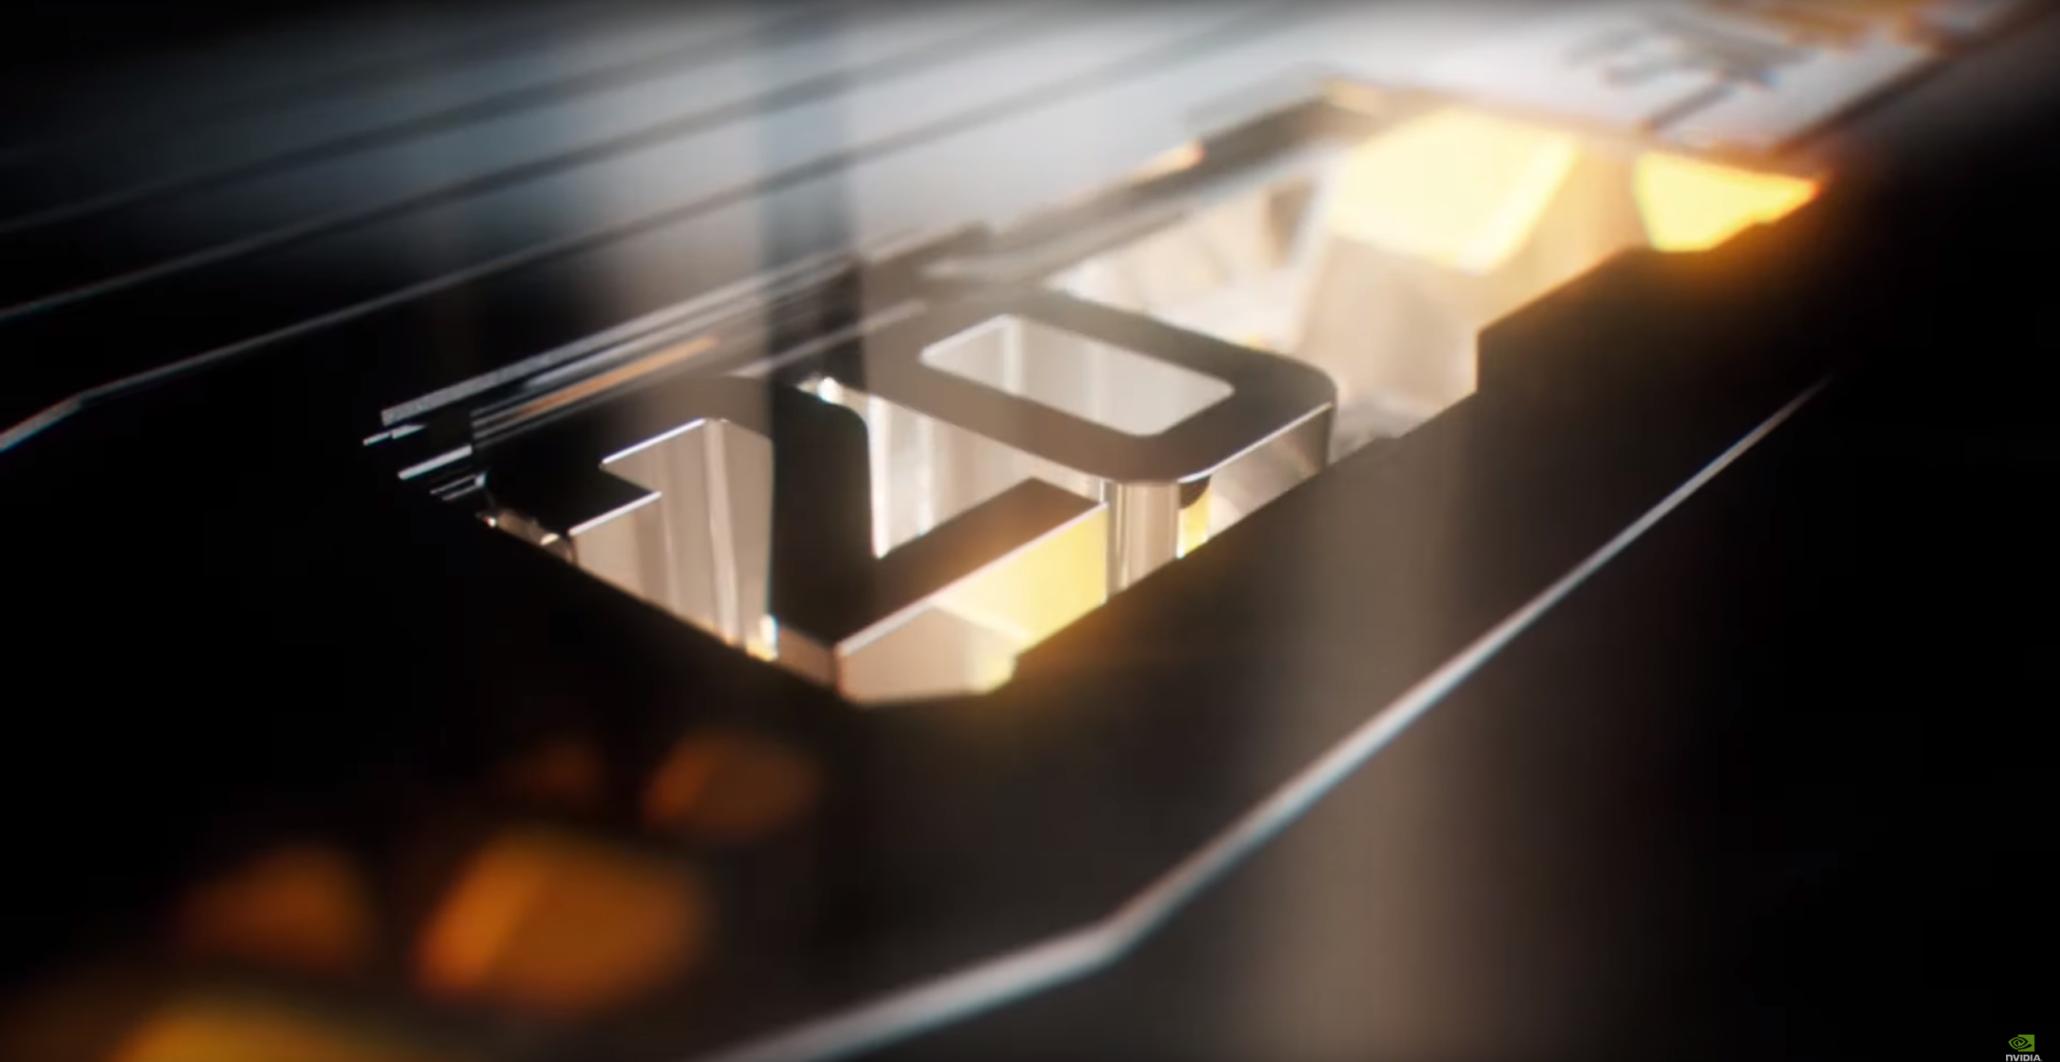 AMD Radeon RX 5700 & NVIDIA GeForce RTX 2070 SUPER GPU Benchmark